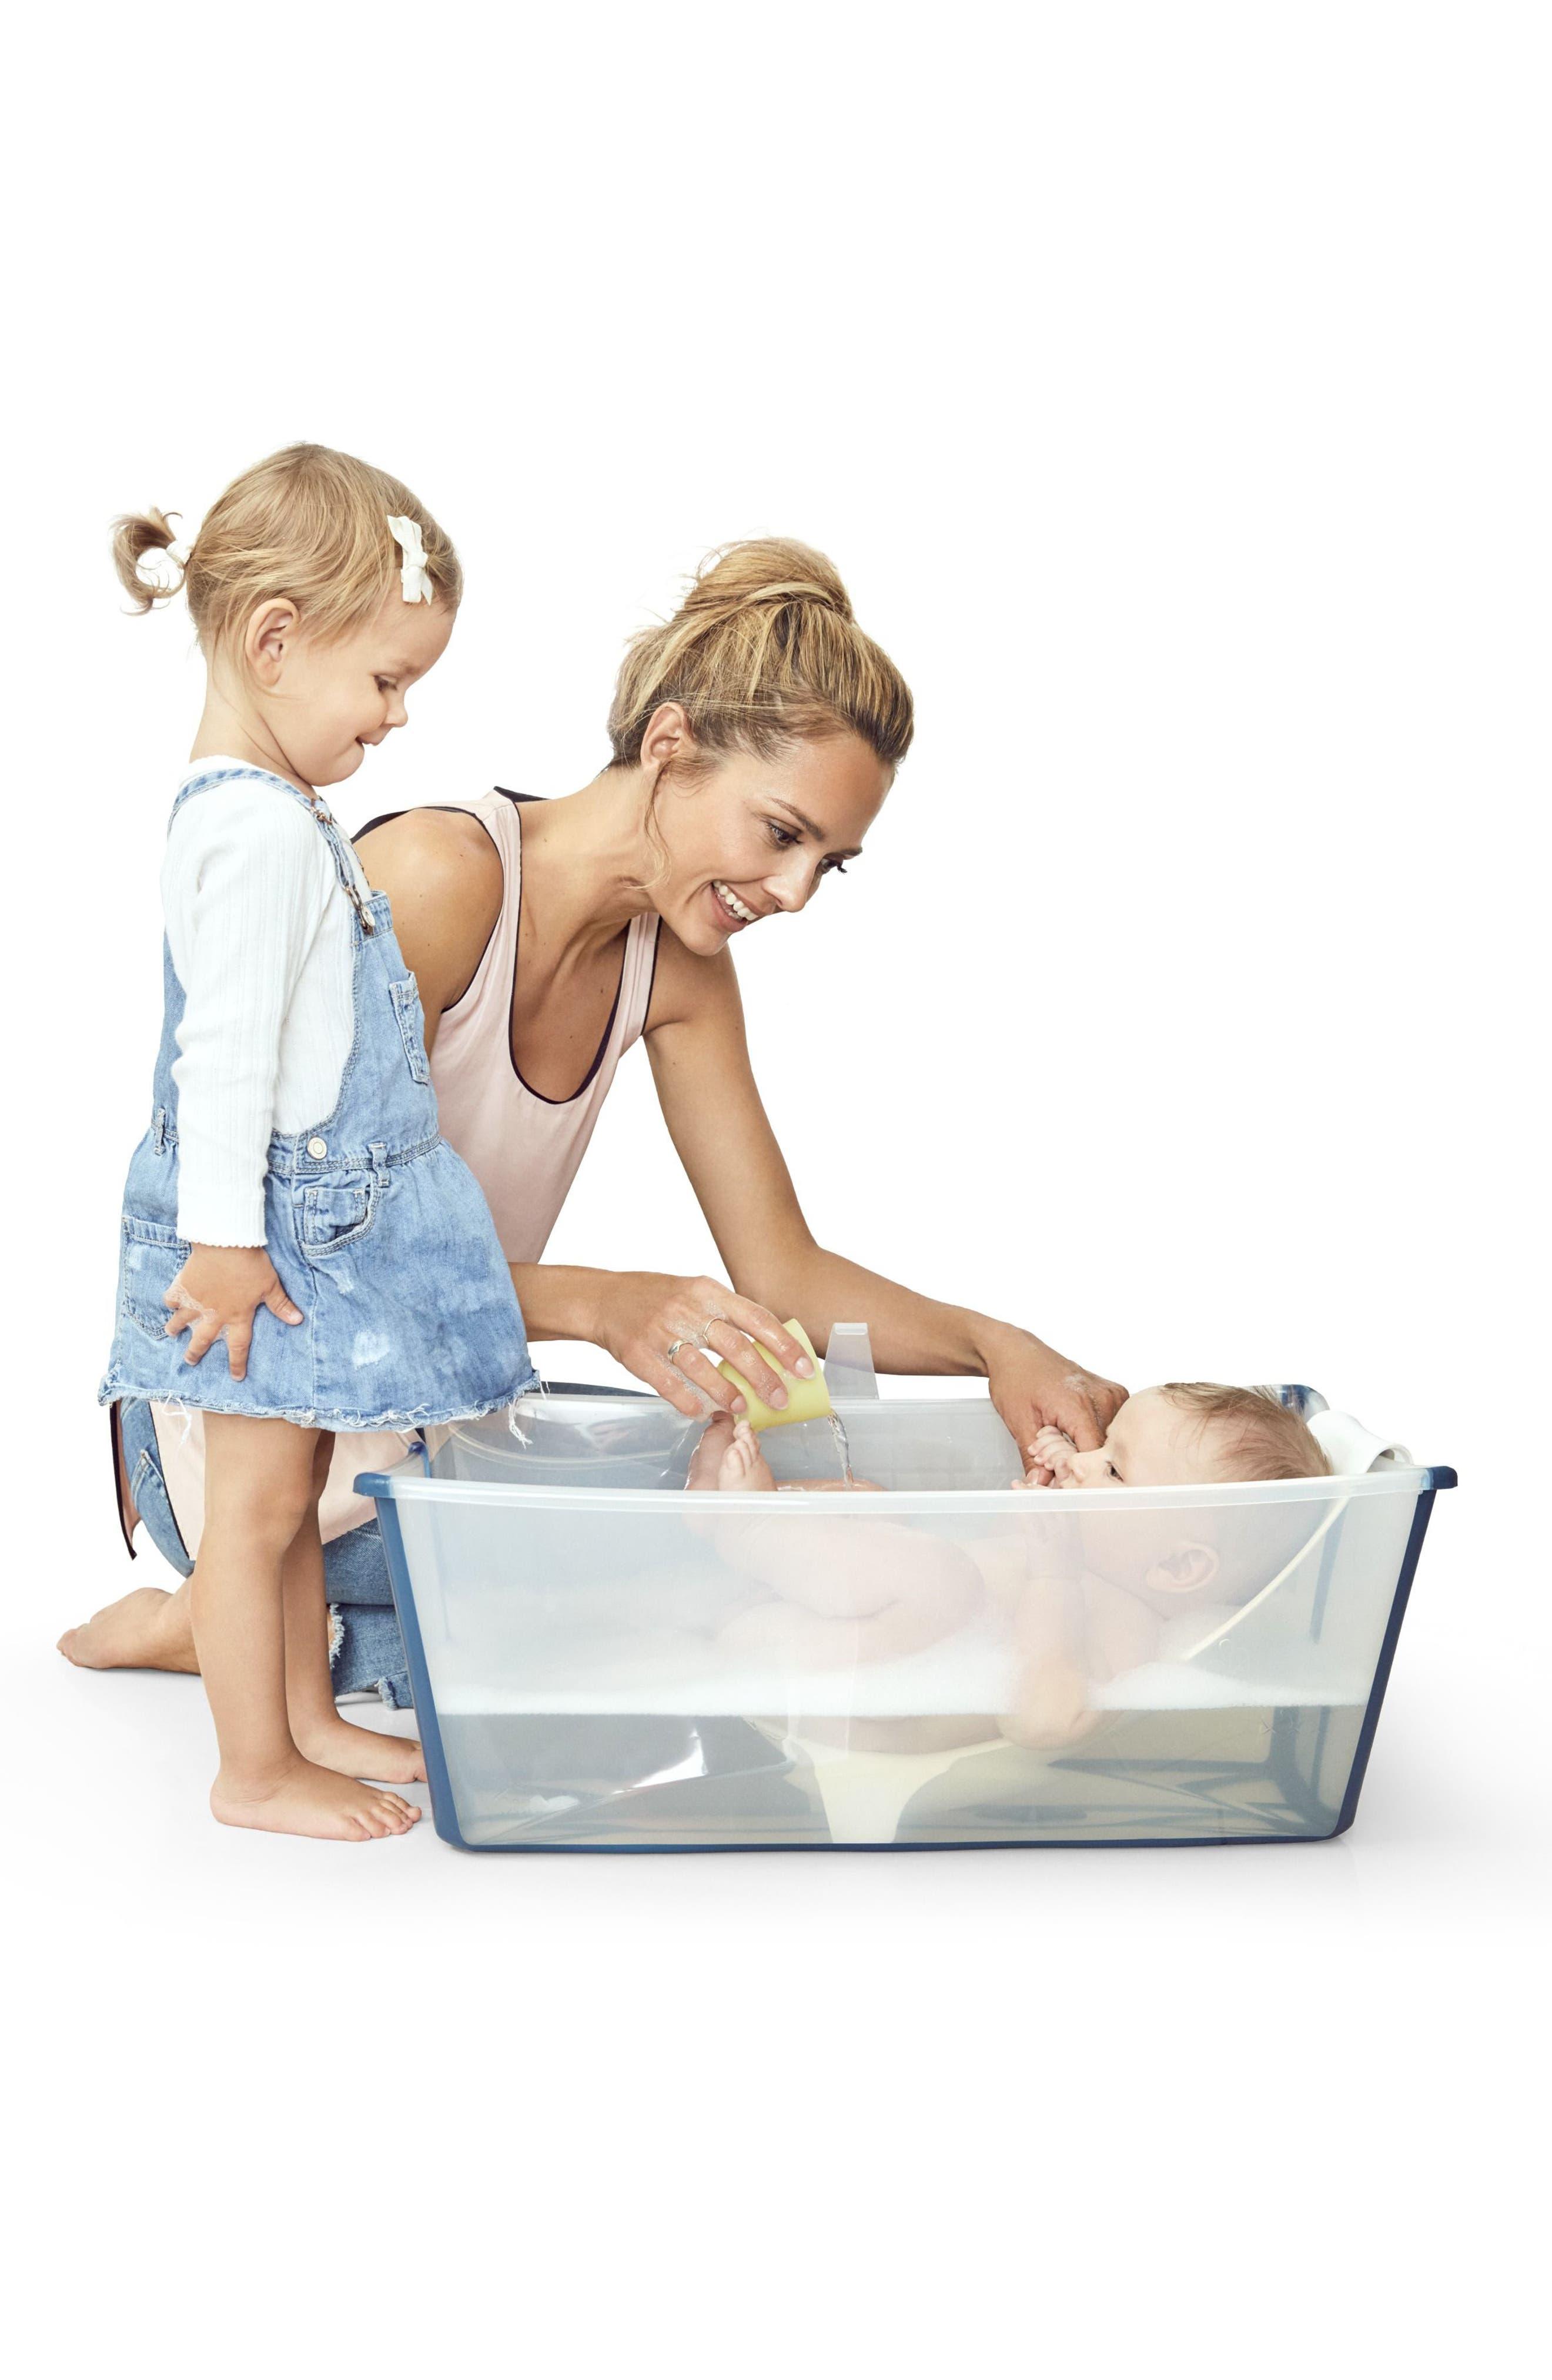 Flexi Bath<sup>®</sup> Foldable Baby Bath Tub with Newborn Support,                             Alternate thumbnail 3, color,                             Transparent Blue